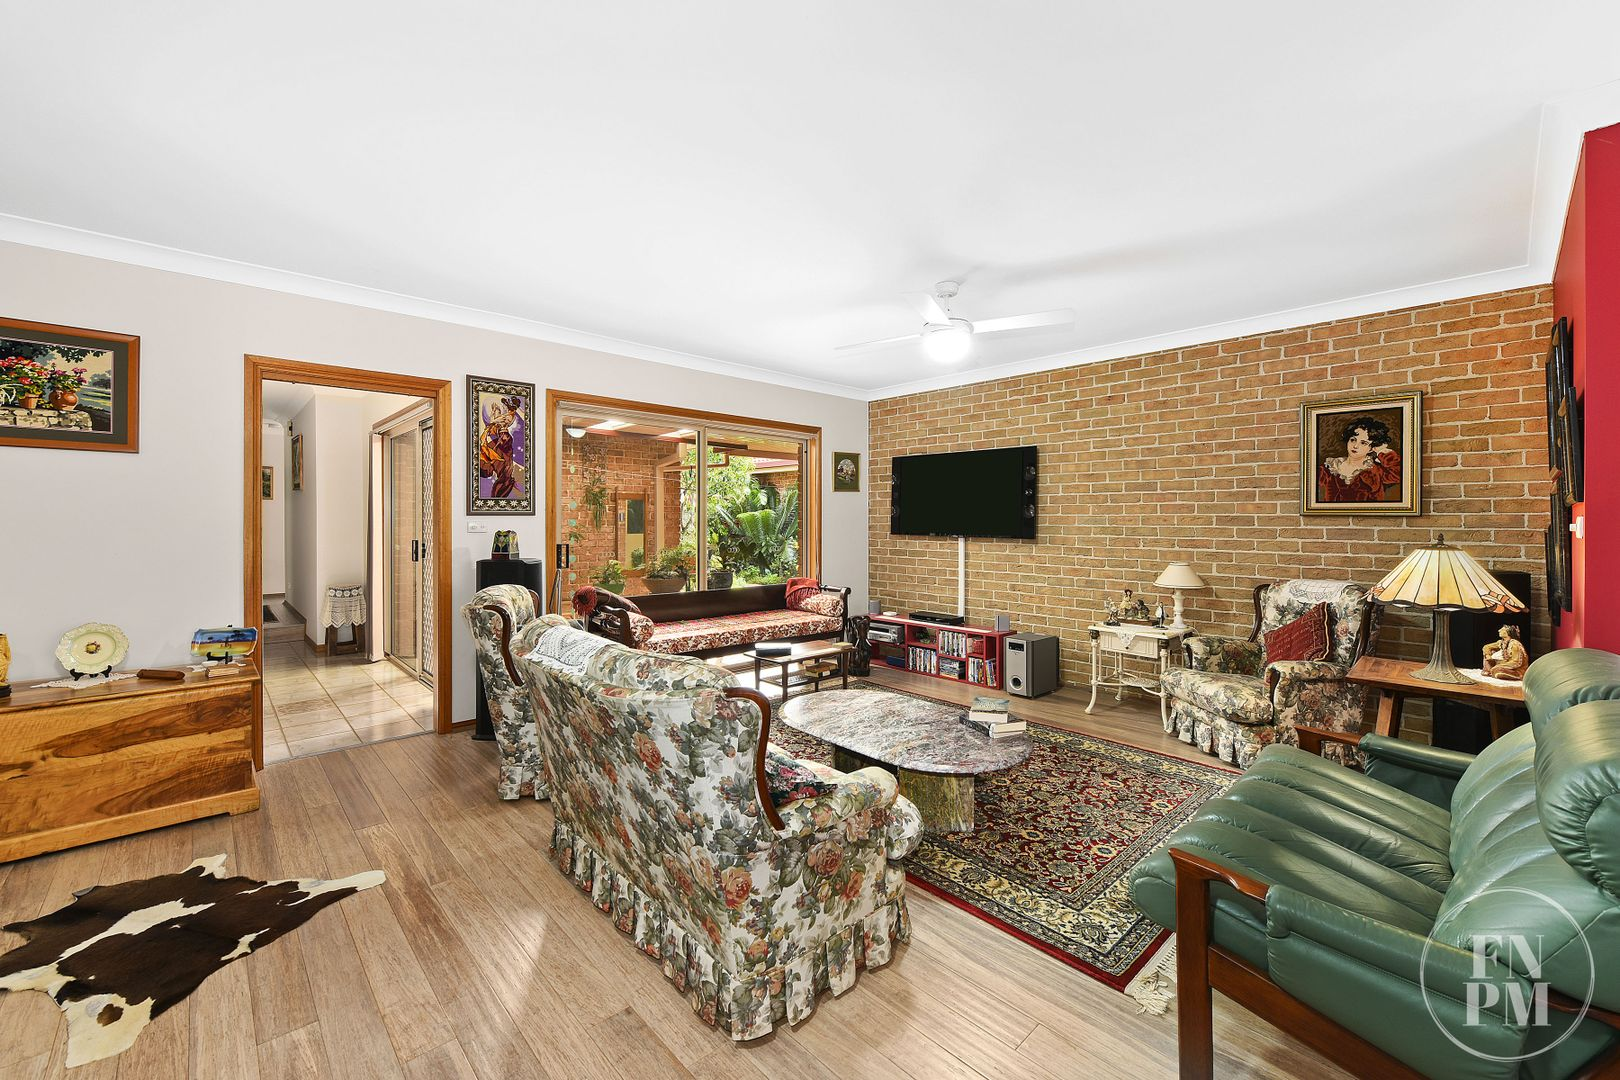 2/19 Denehurst Place, Port Macquarie NSW 2444, Image 2